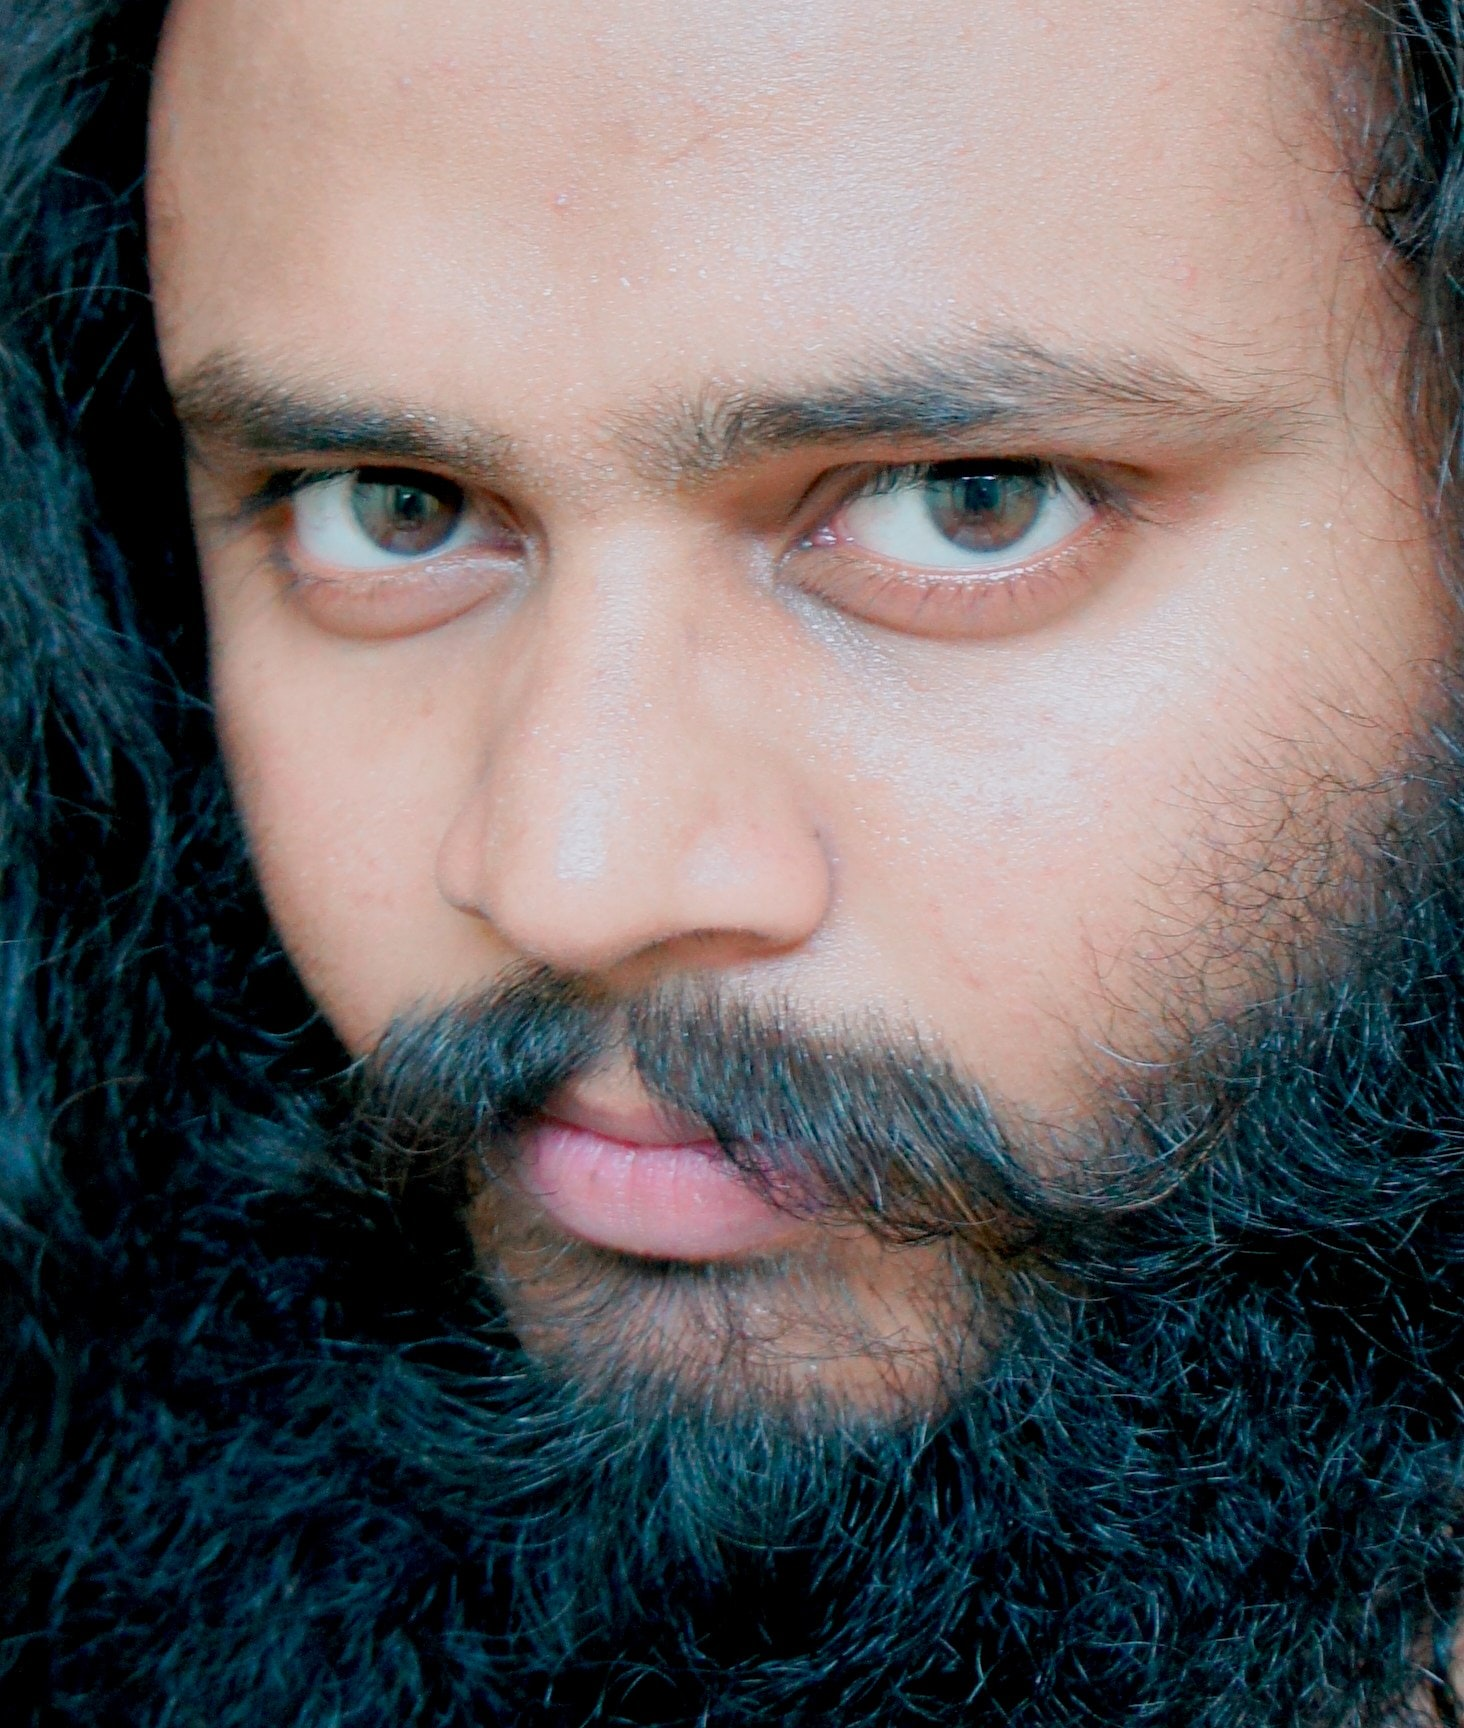 Go to Subhkaran Singh's profile